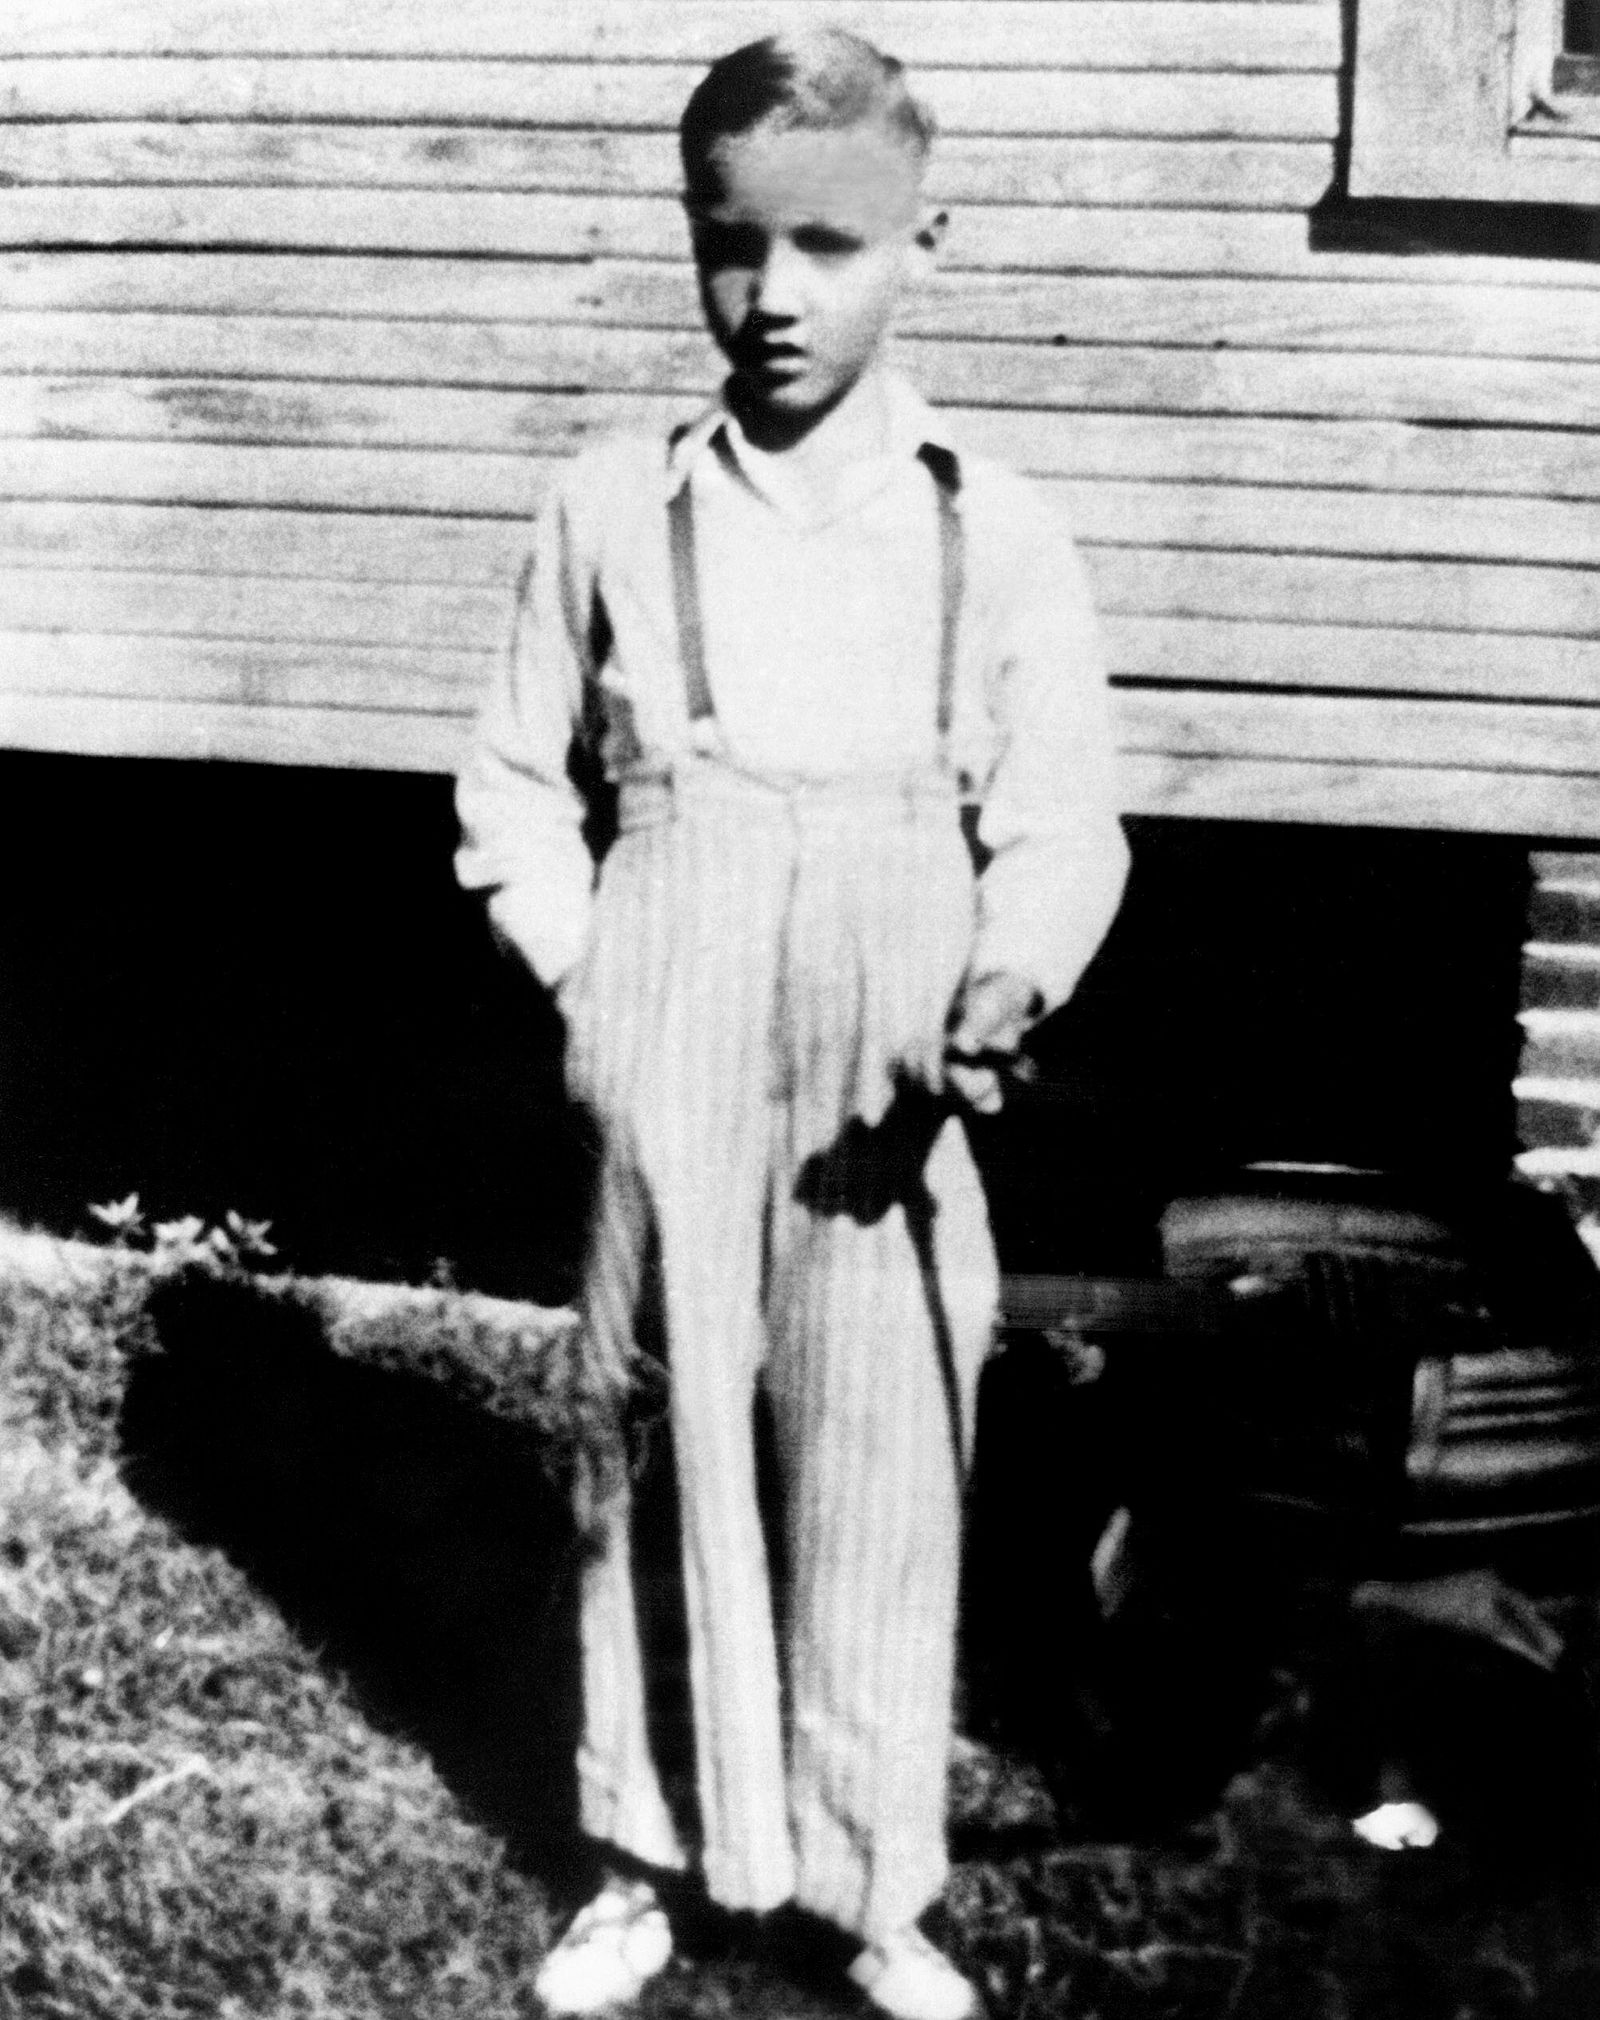 Elvis Presley Singer & Actor 22 March 1944 PUBLICATIONxINxGERxSUIxAUTxONLY Copyright: MaryxEvansxAFxArchive 12049144 edi